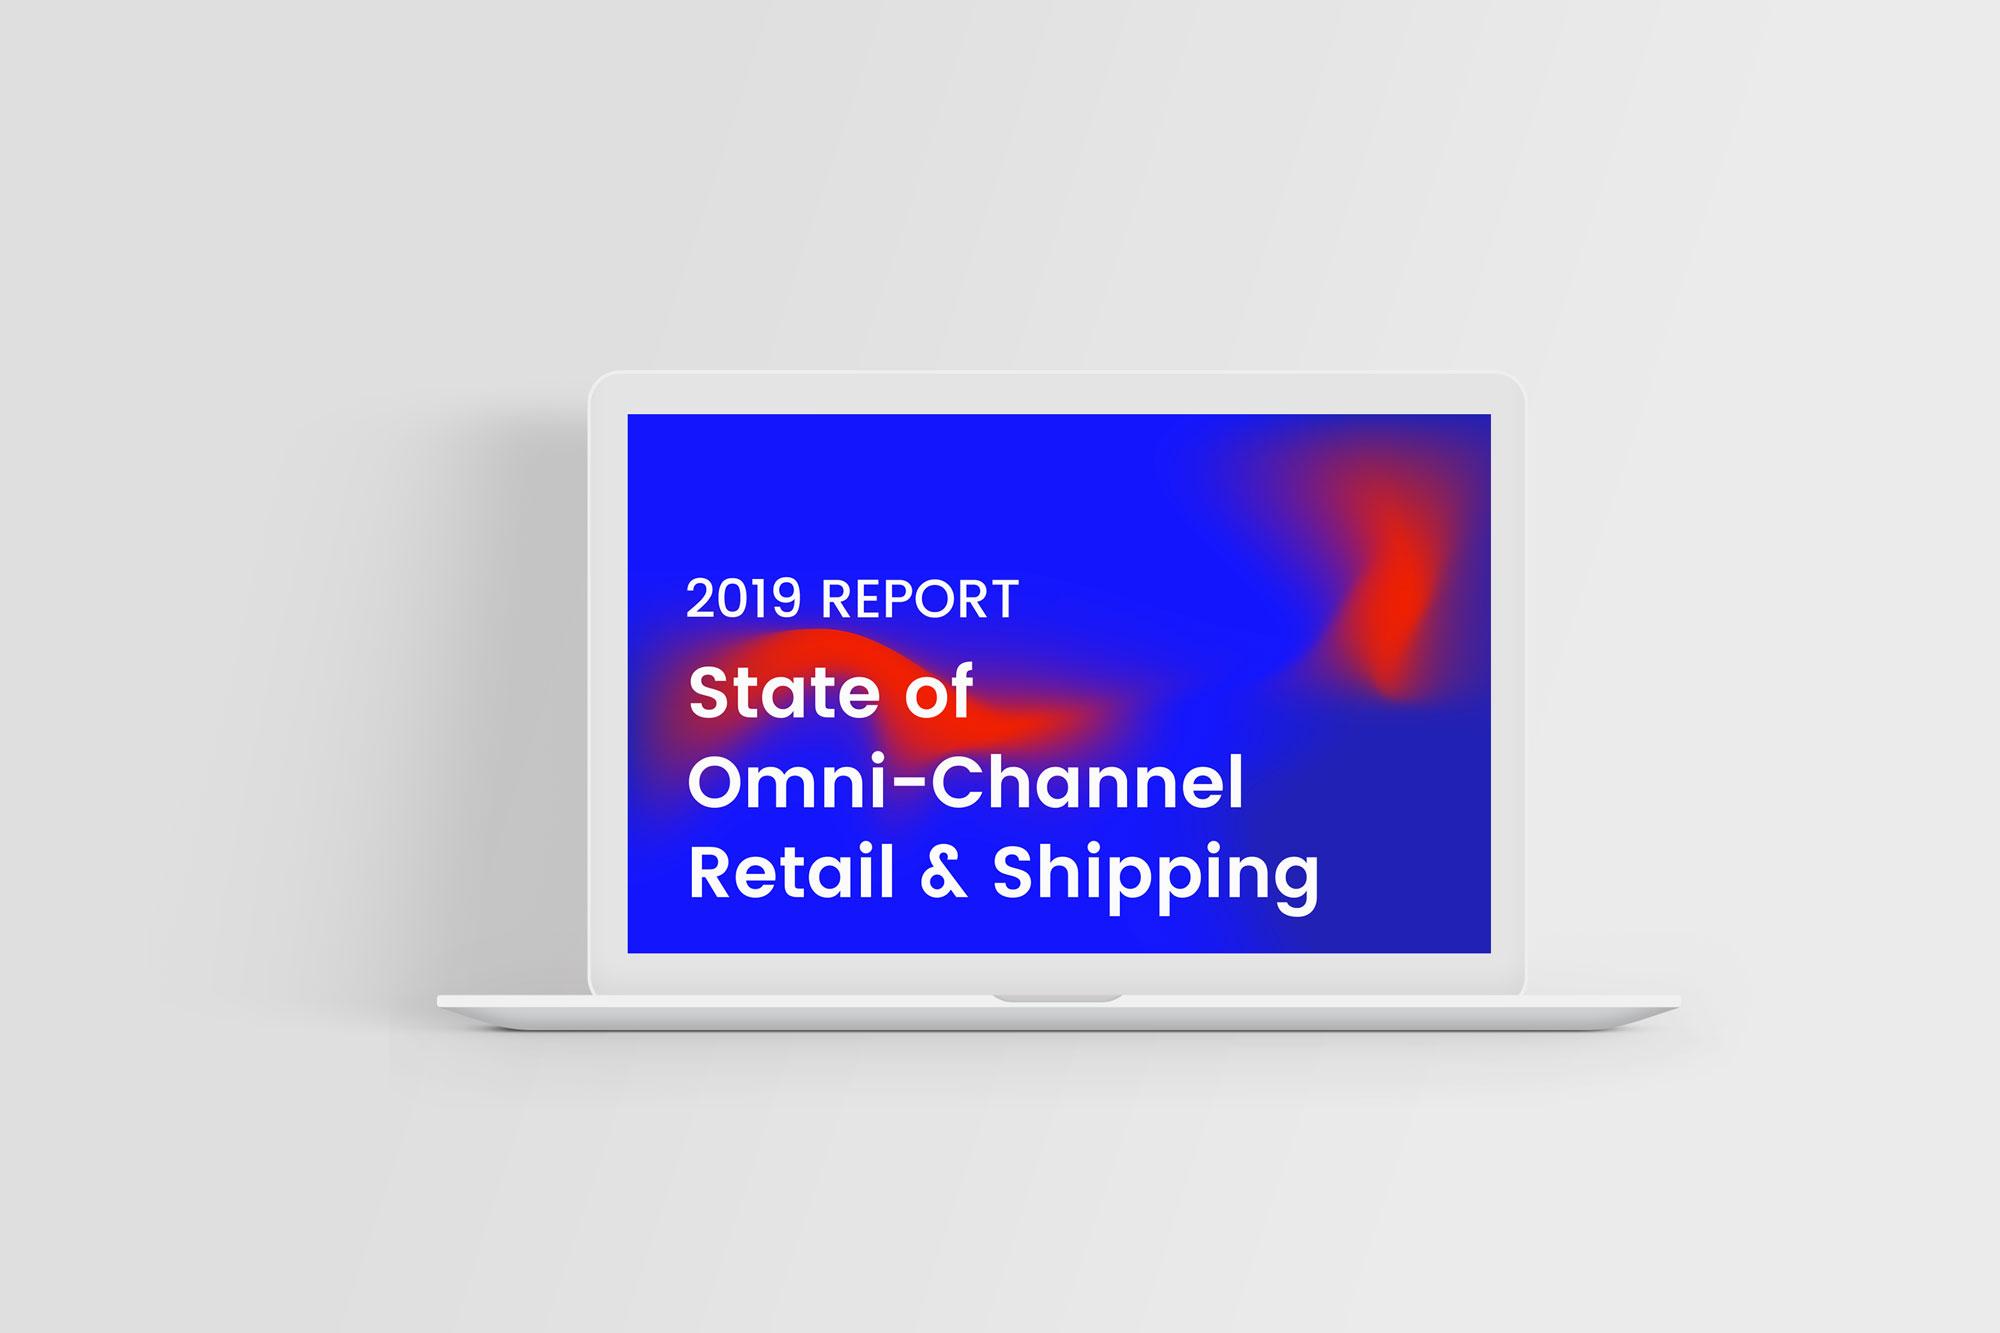 Omni-Channel Retail 2019